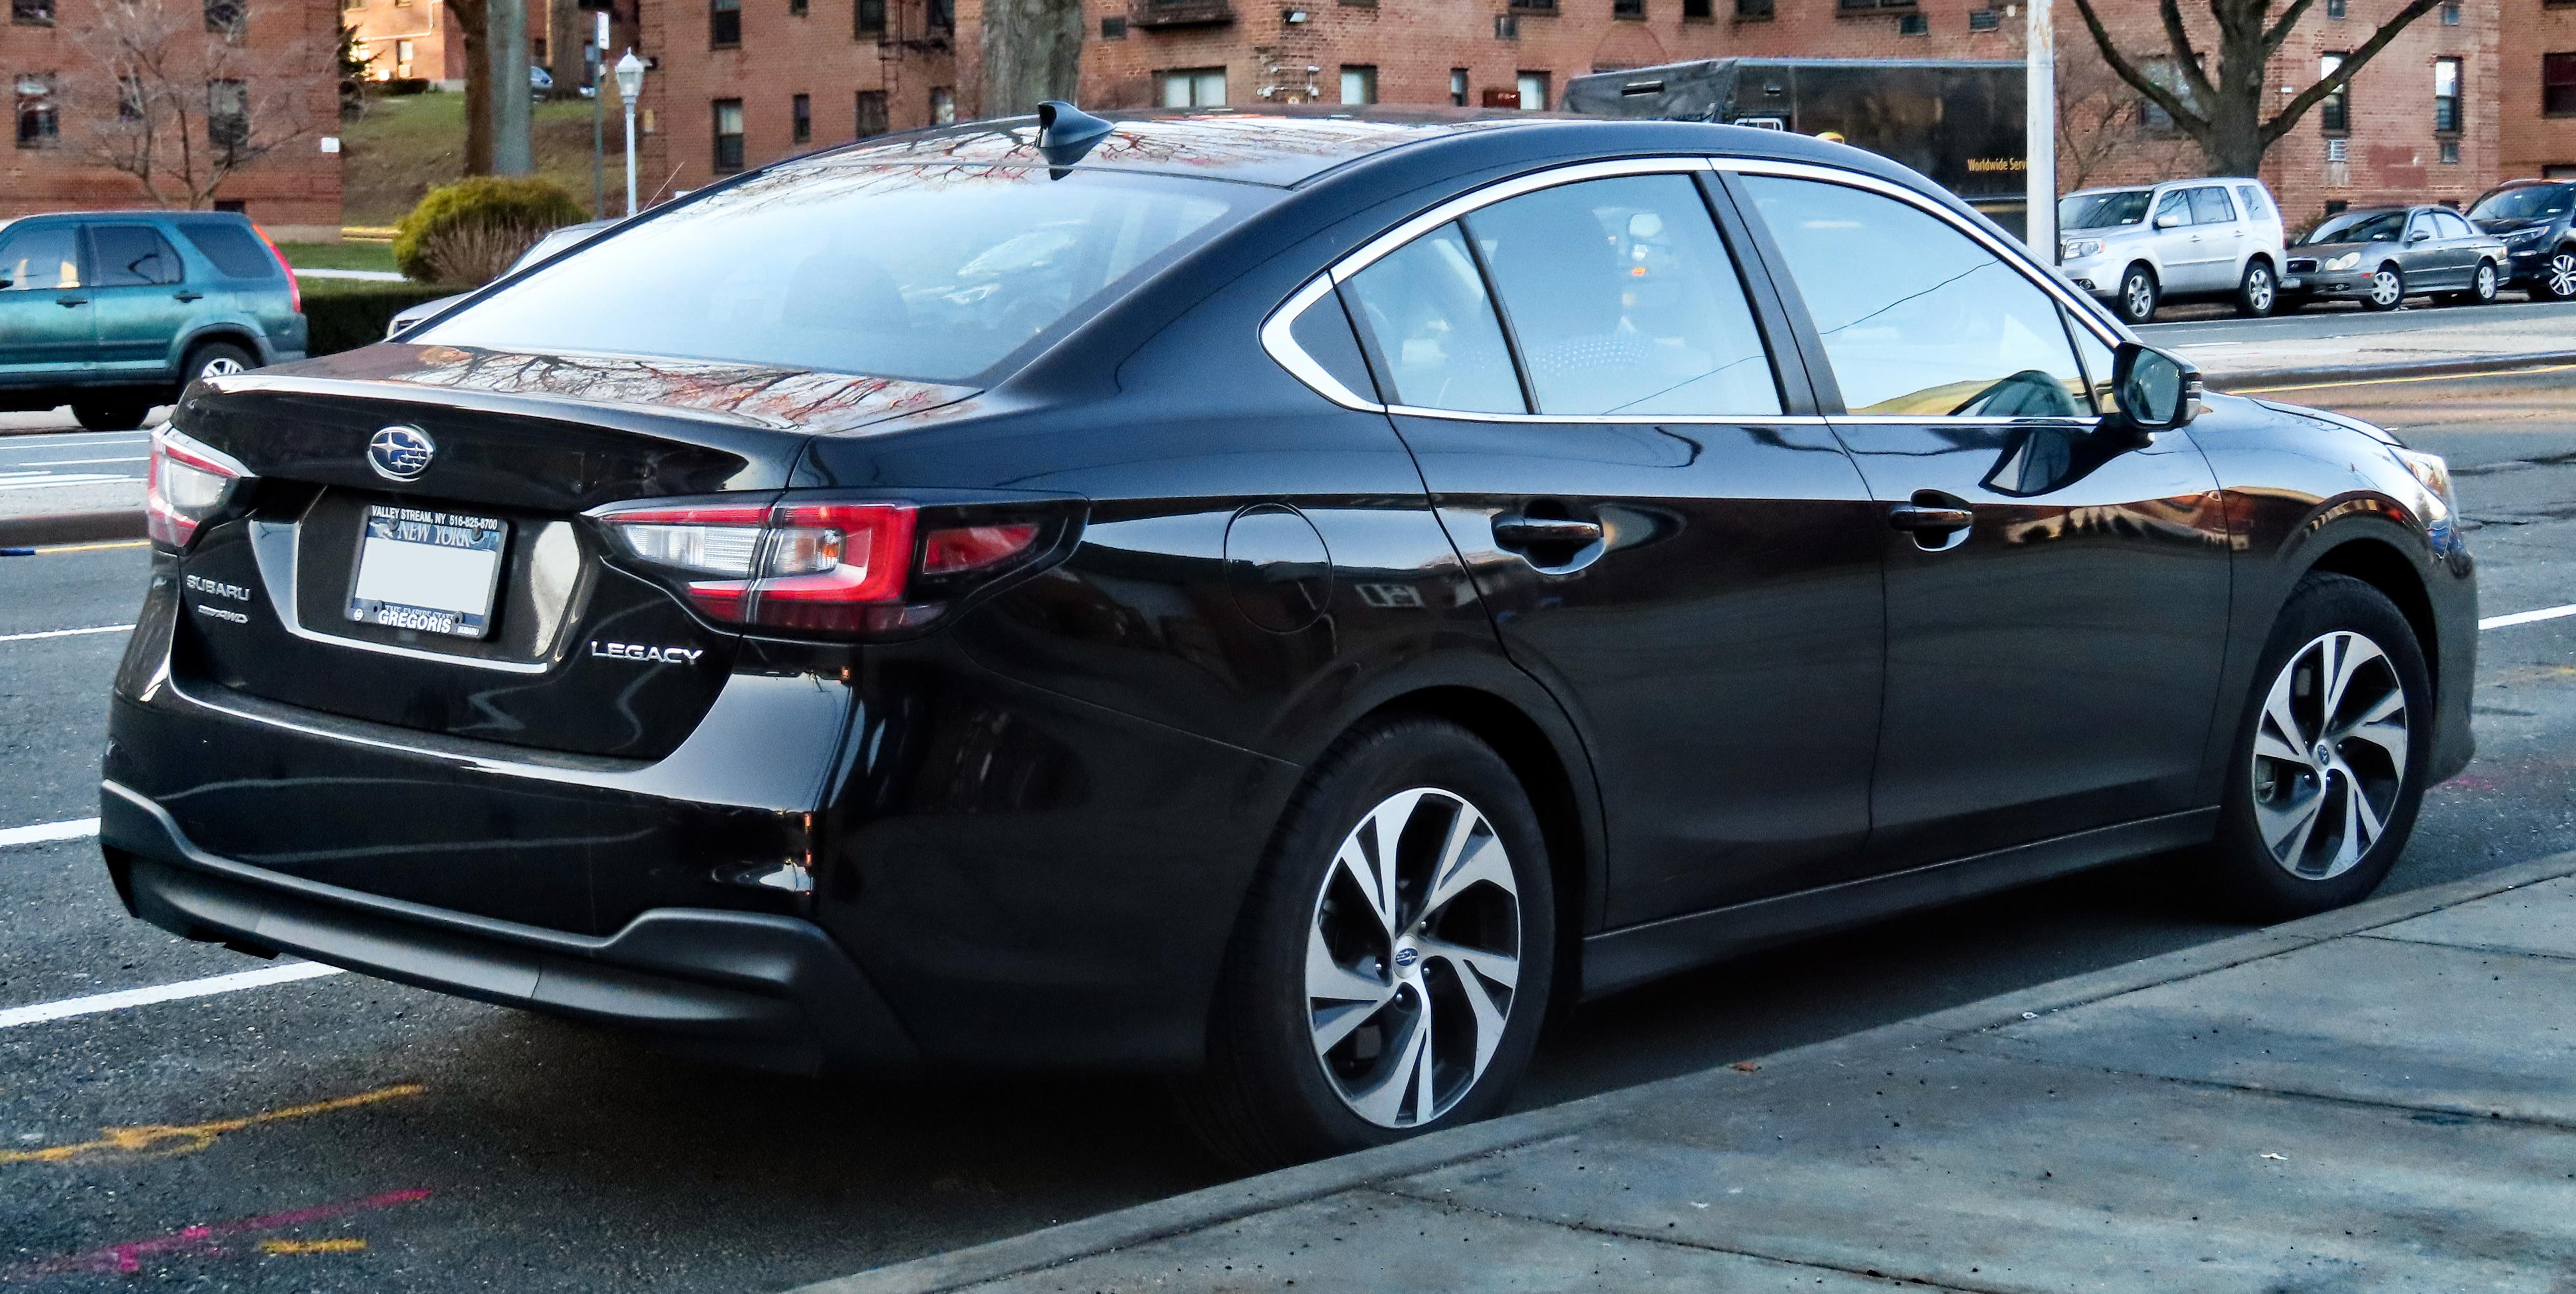 File:2020 Subaru Legacy Premium AWD, rear 2.14.20.jpg - Wikimedia ...